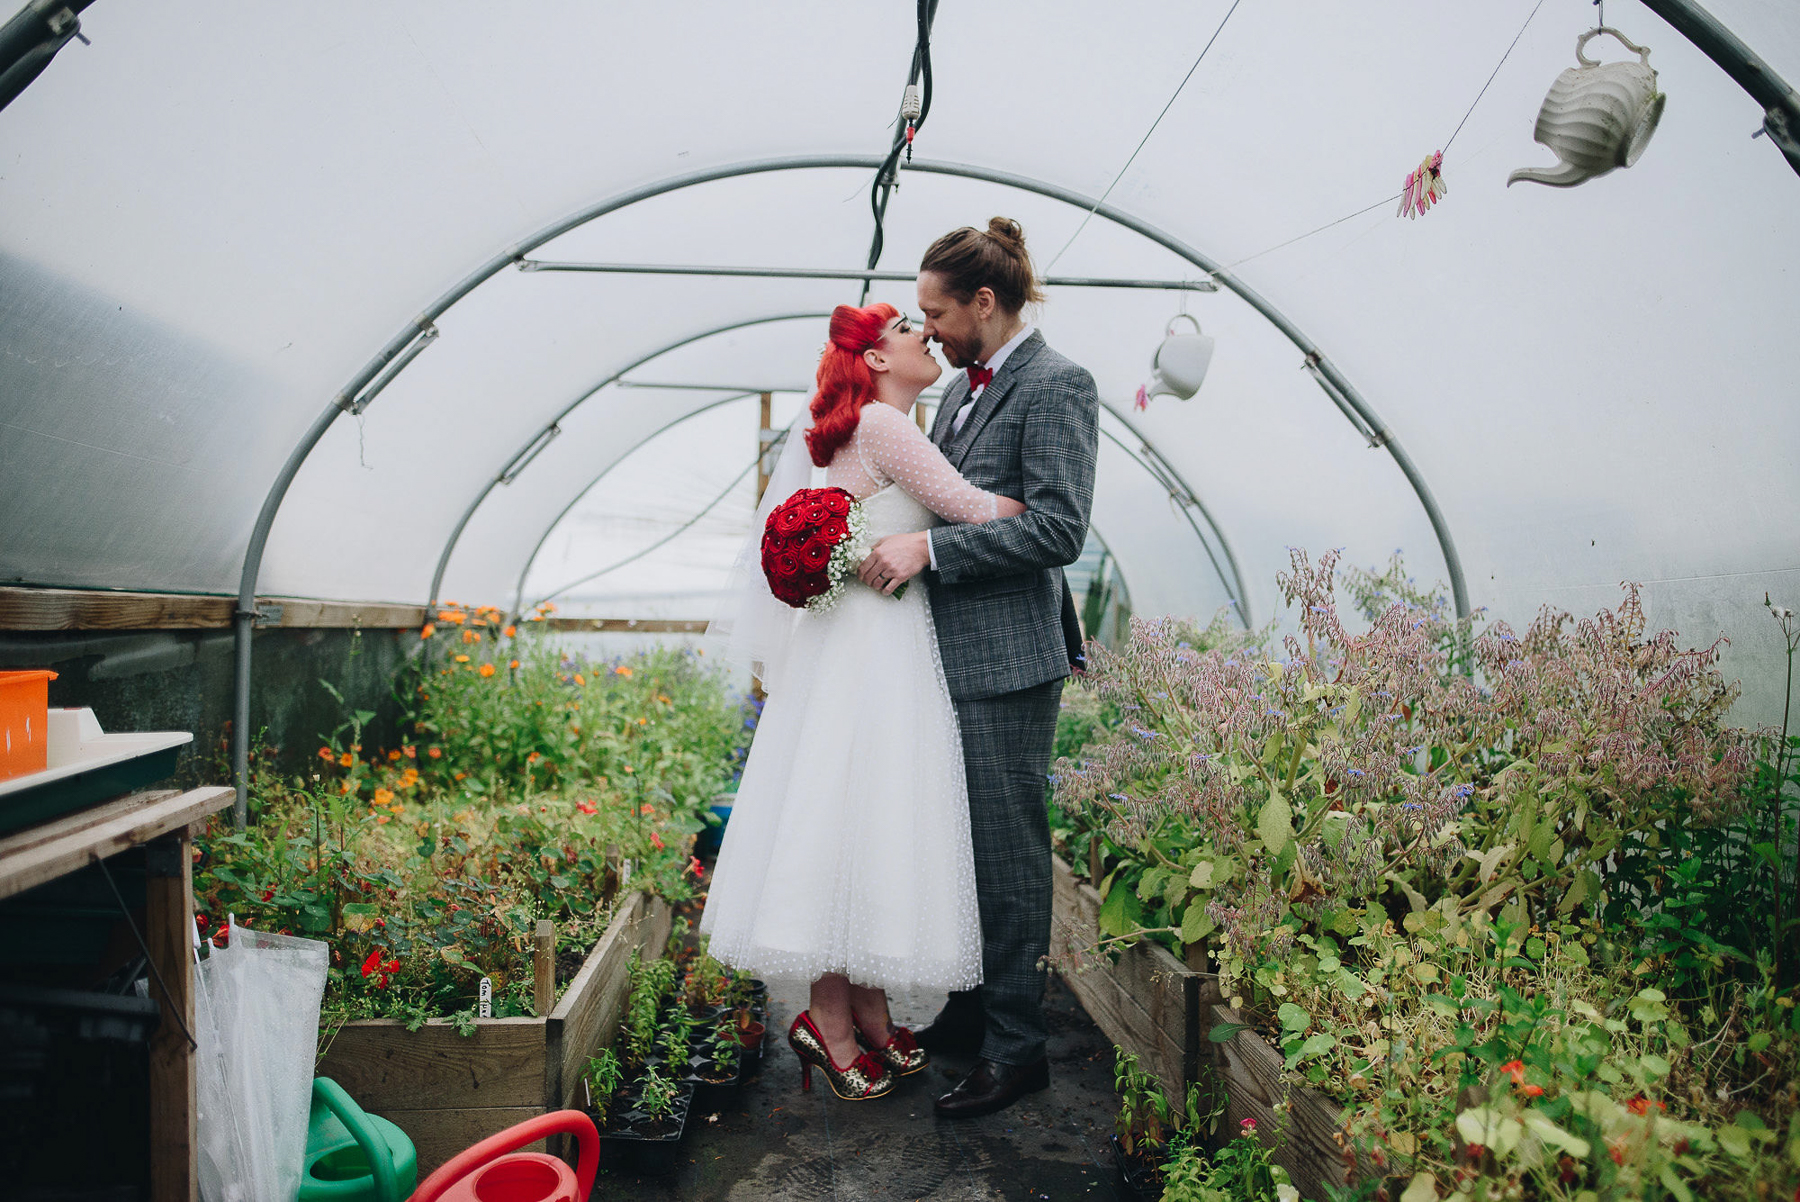 Wellbeing_Farm_Wedding_Photography_The_Pin-Up_Bride_Lara_Shaun-96.jpg